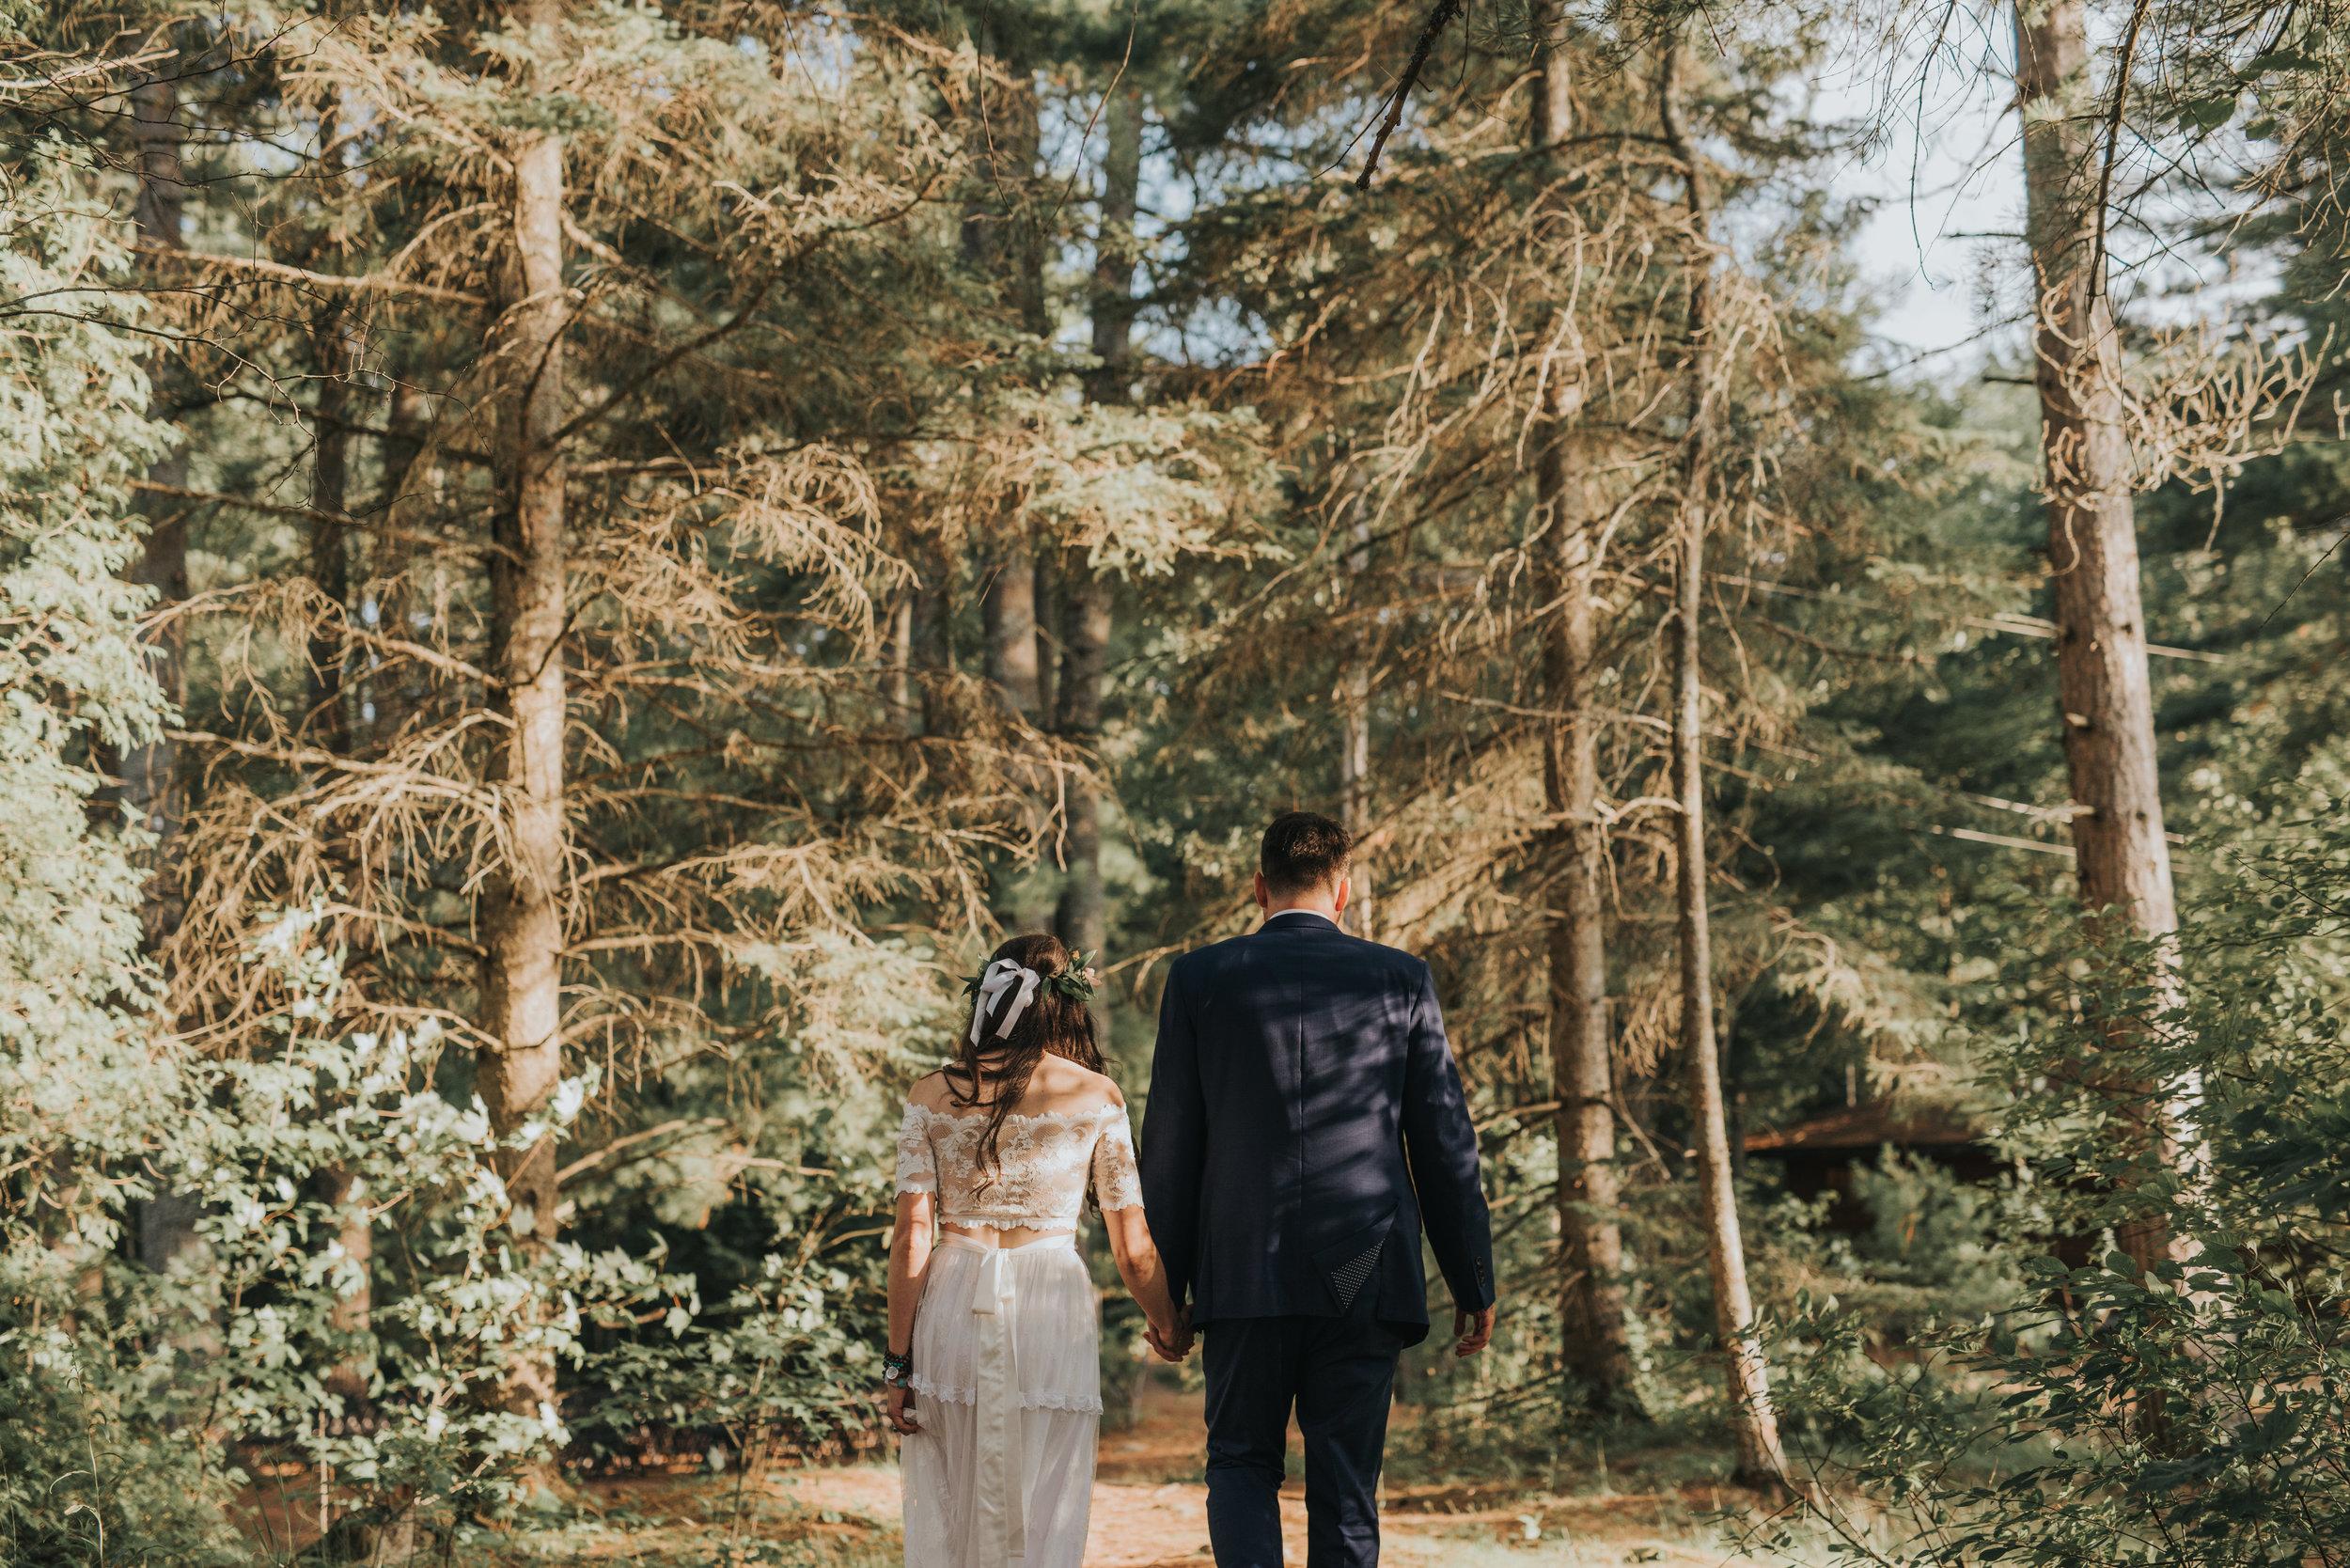 bride-groom-portraits-rustic-cabin-toronto-bohemian-boho-outdoor-summer-wedding-documentary-wedding-photography-by-willow-birch-photo.jpg